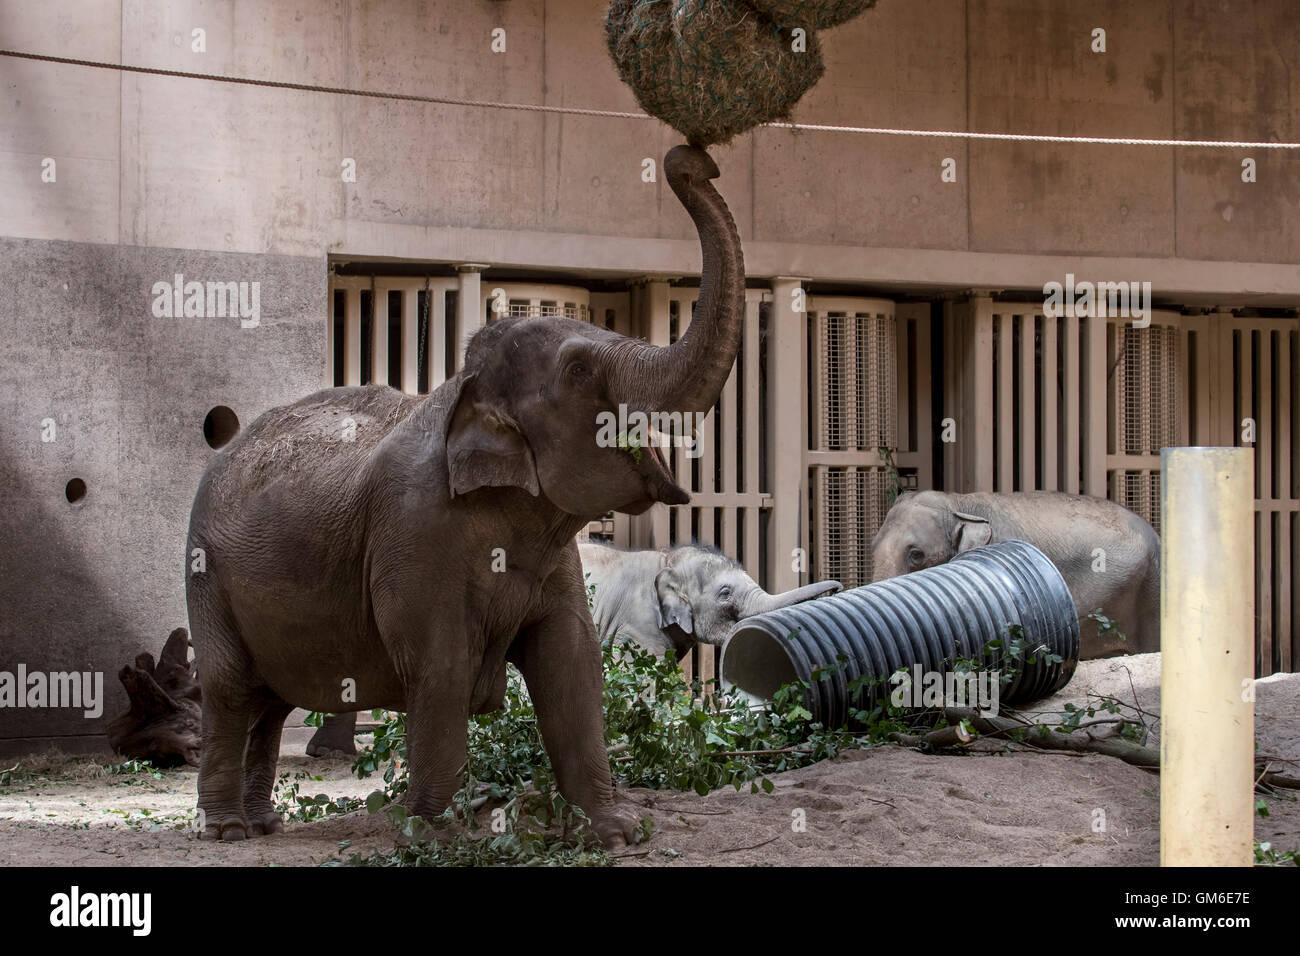 Asiatischer Elefant / asiatischen Elefanten (Elephas Maximus) Essen Heu in der Innenanlage in Planckendael Zoo, Stockbild